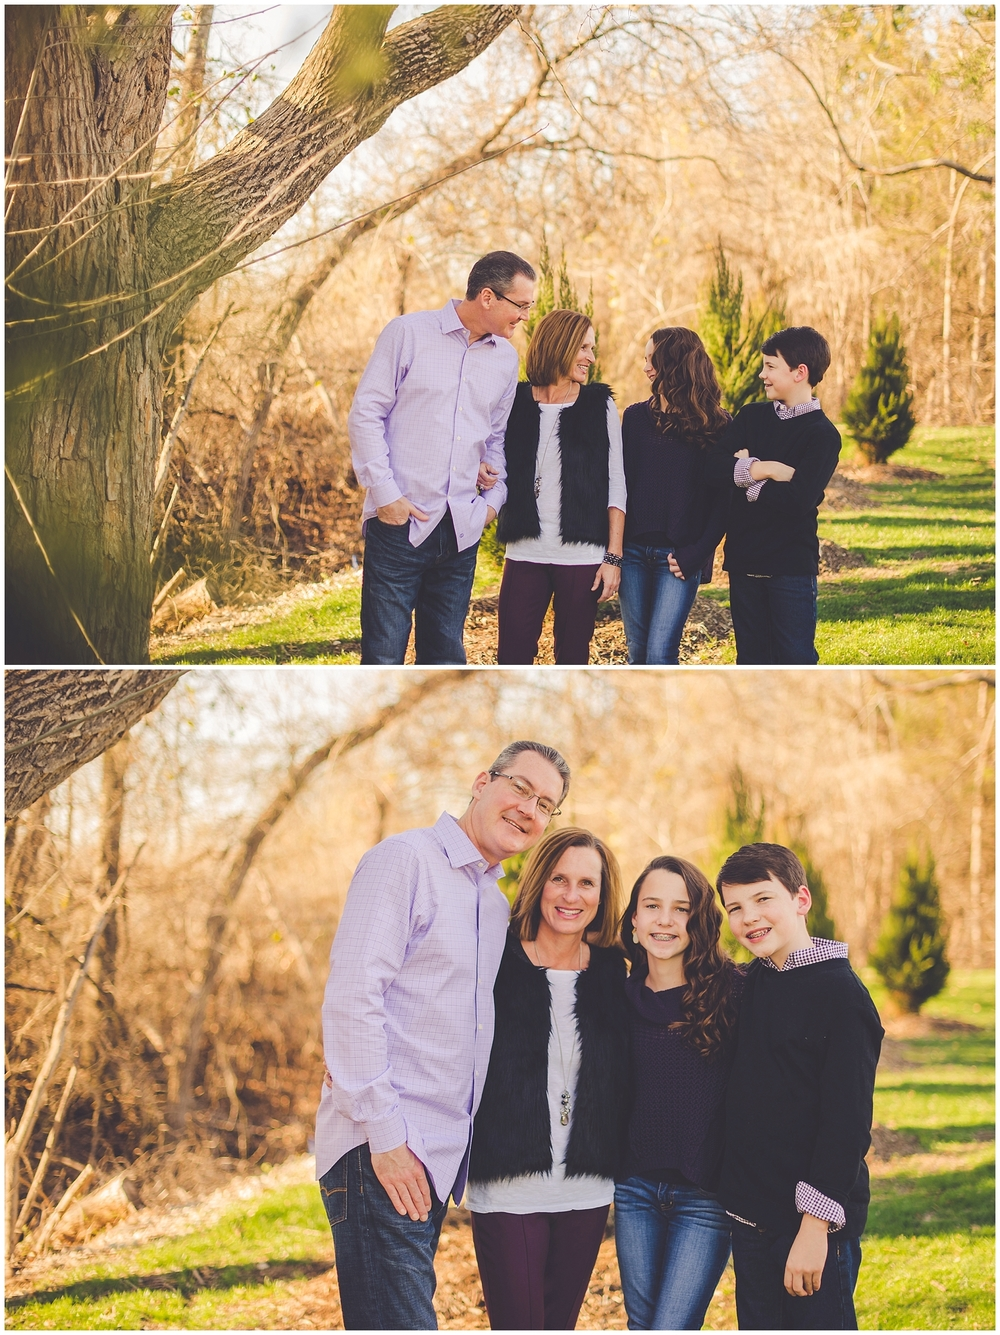 By Kara - Kara Evans - Central Illinois Travel Photographer - Texas Family Photographer - Fairview Texas Family Photographer